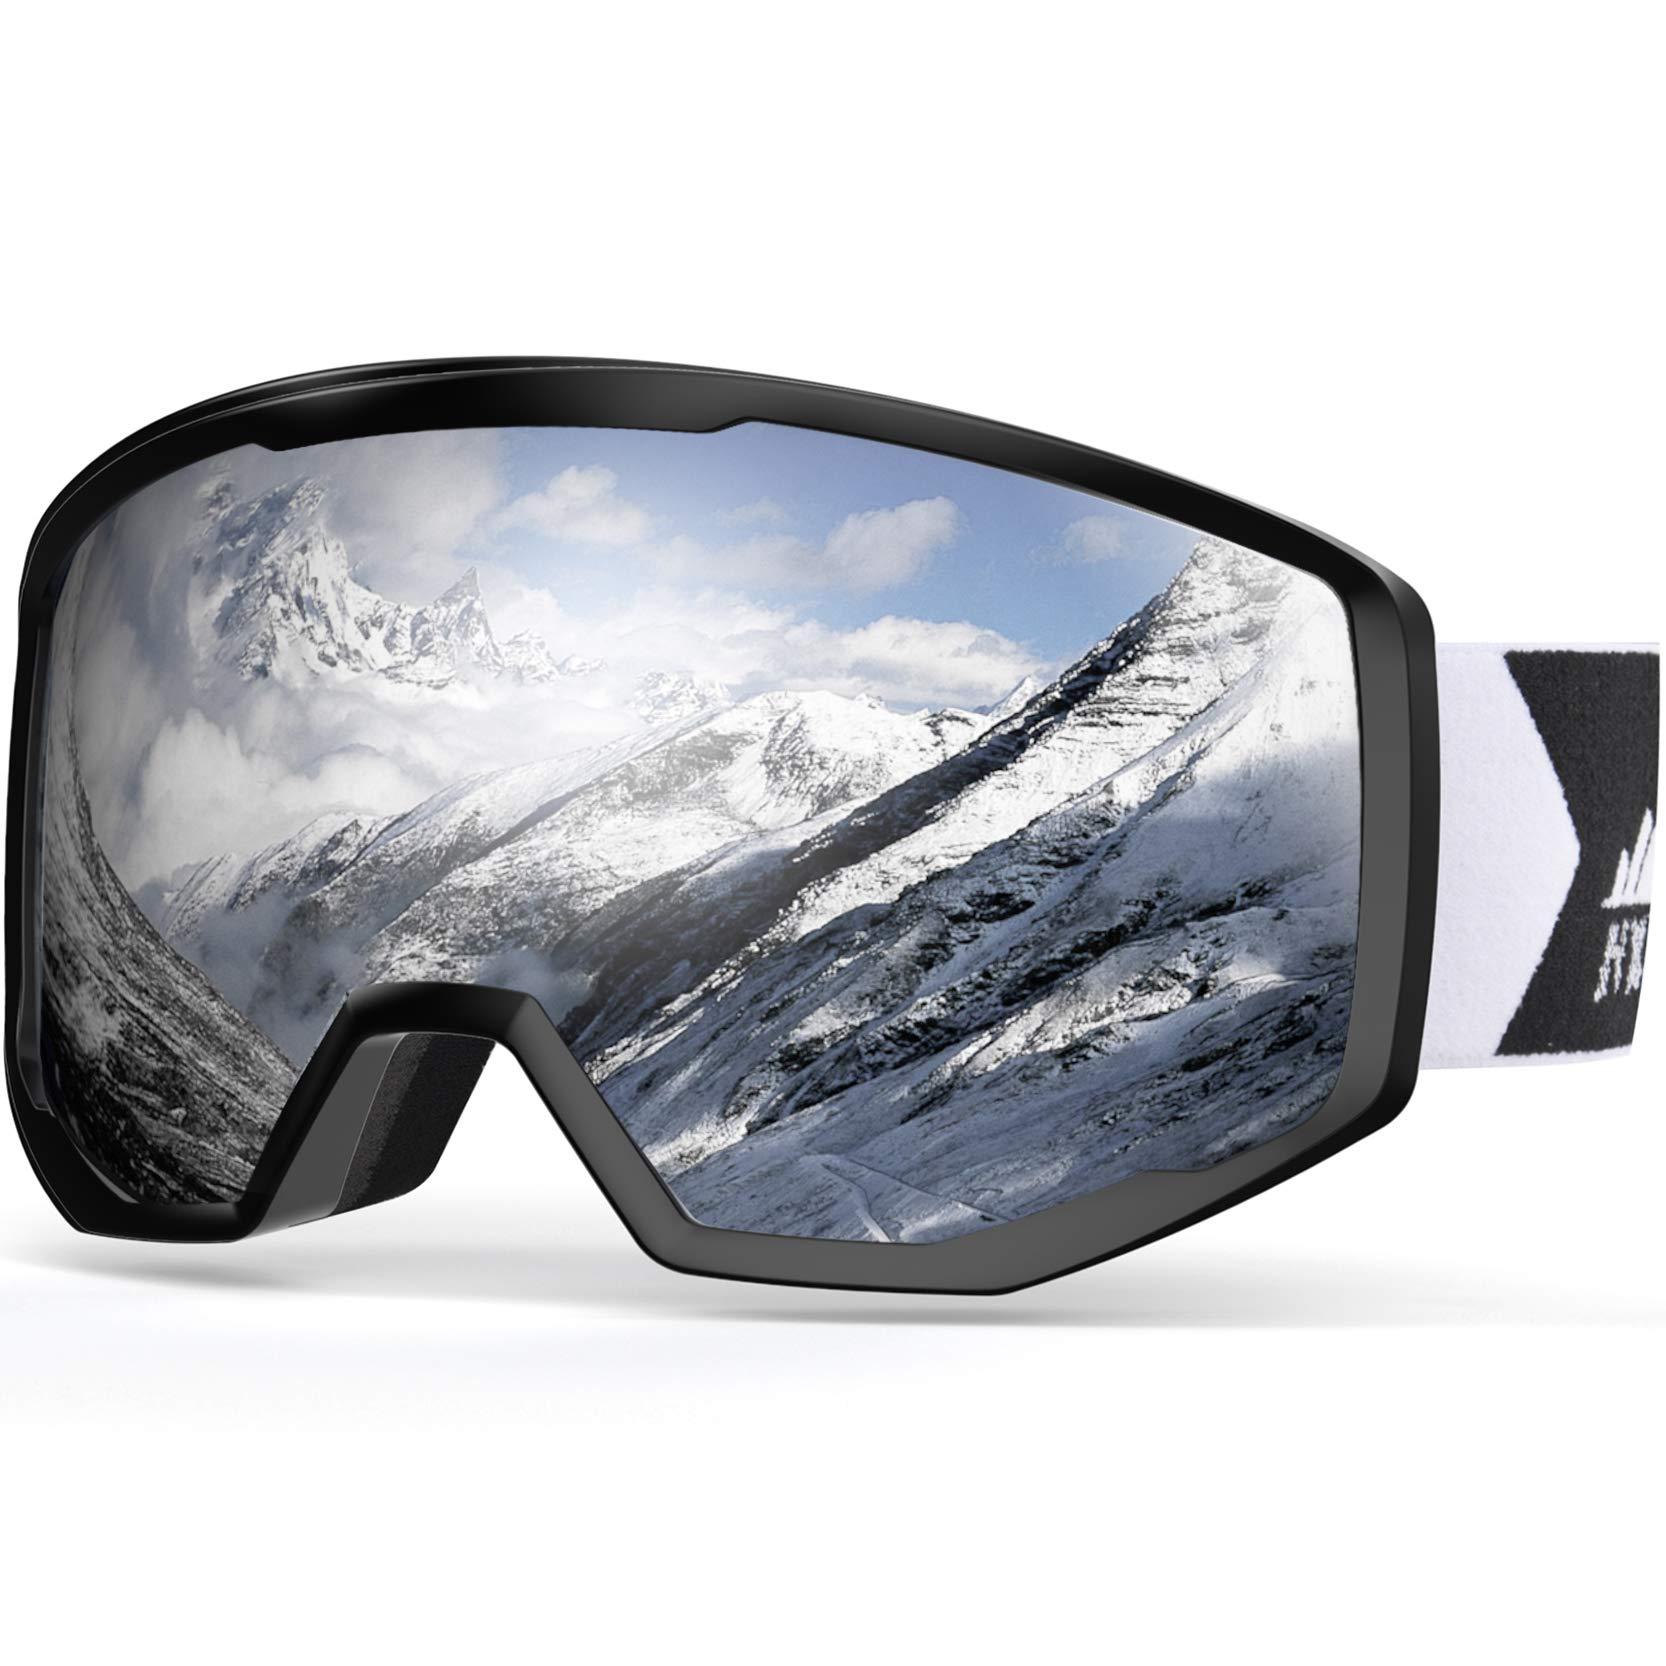 NXONE Ski Goggles